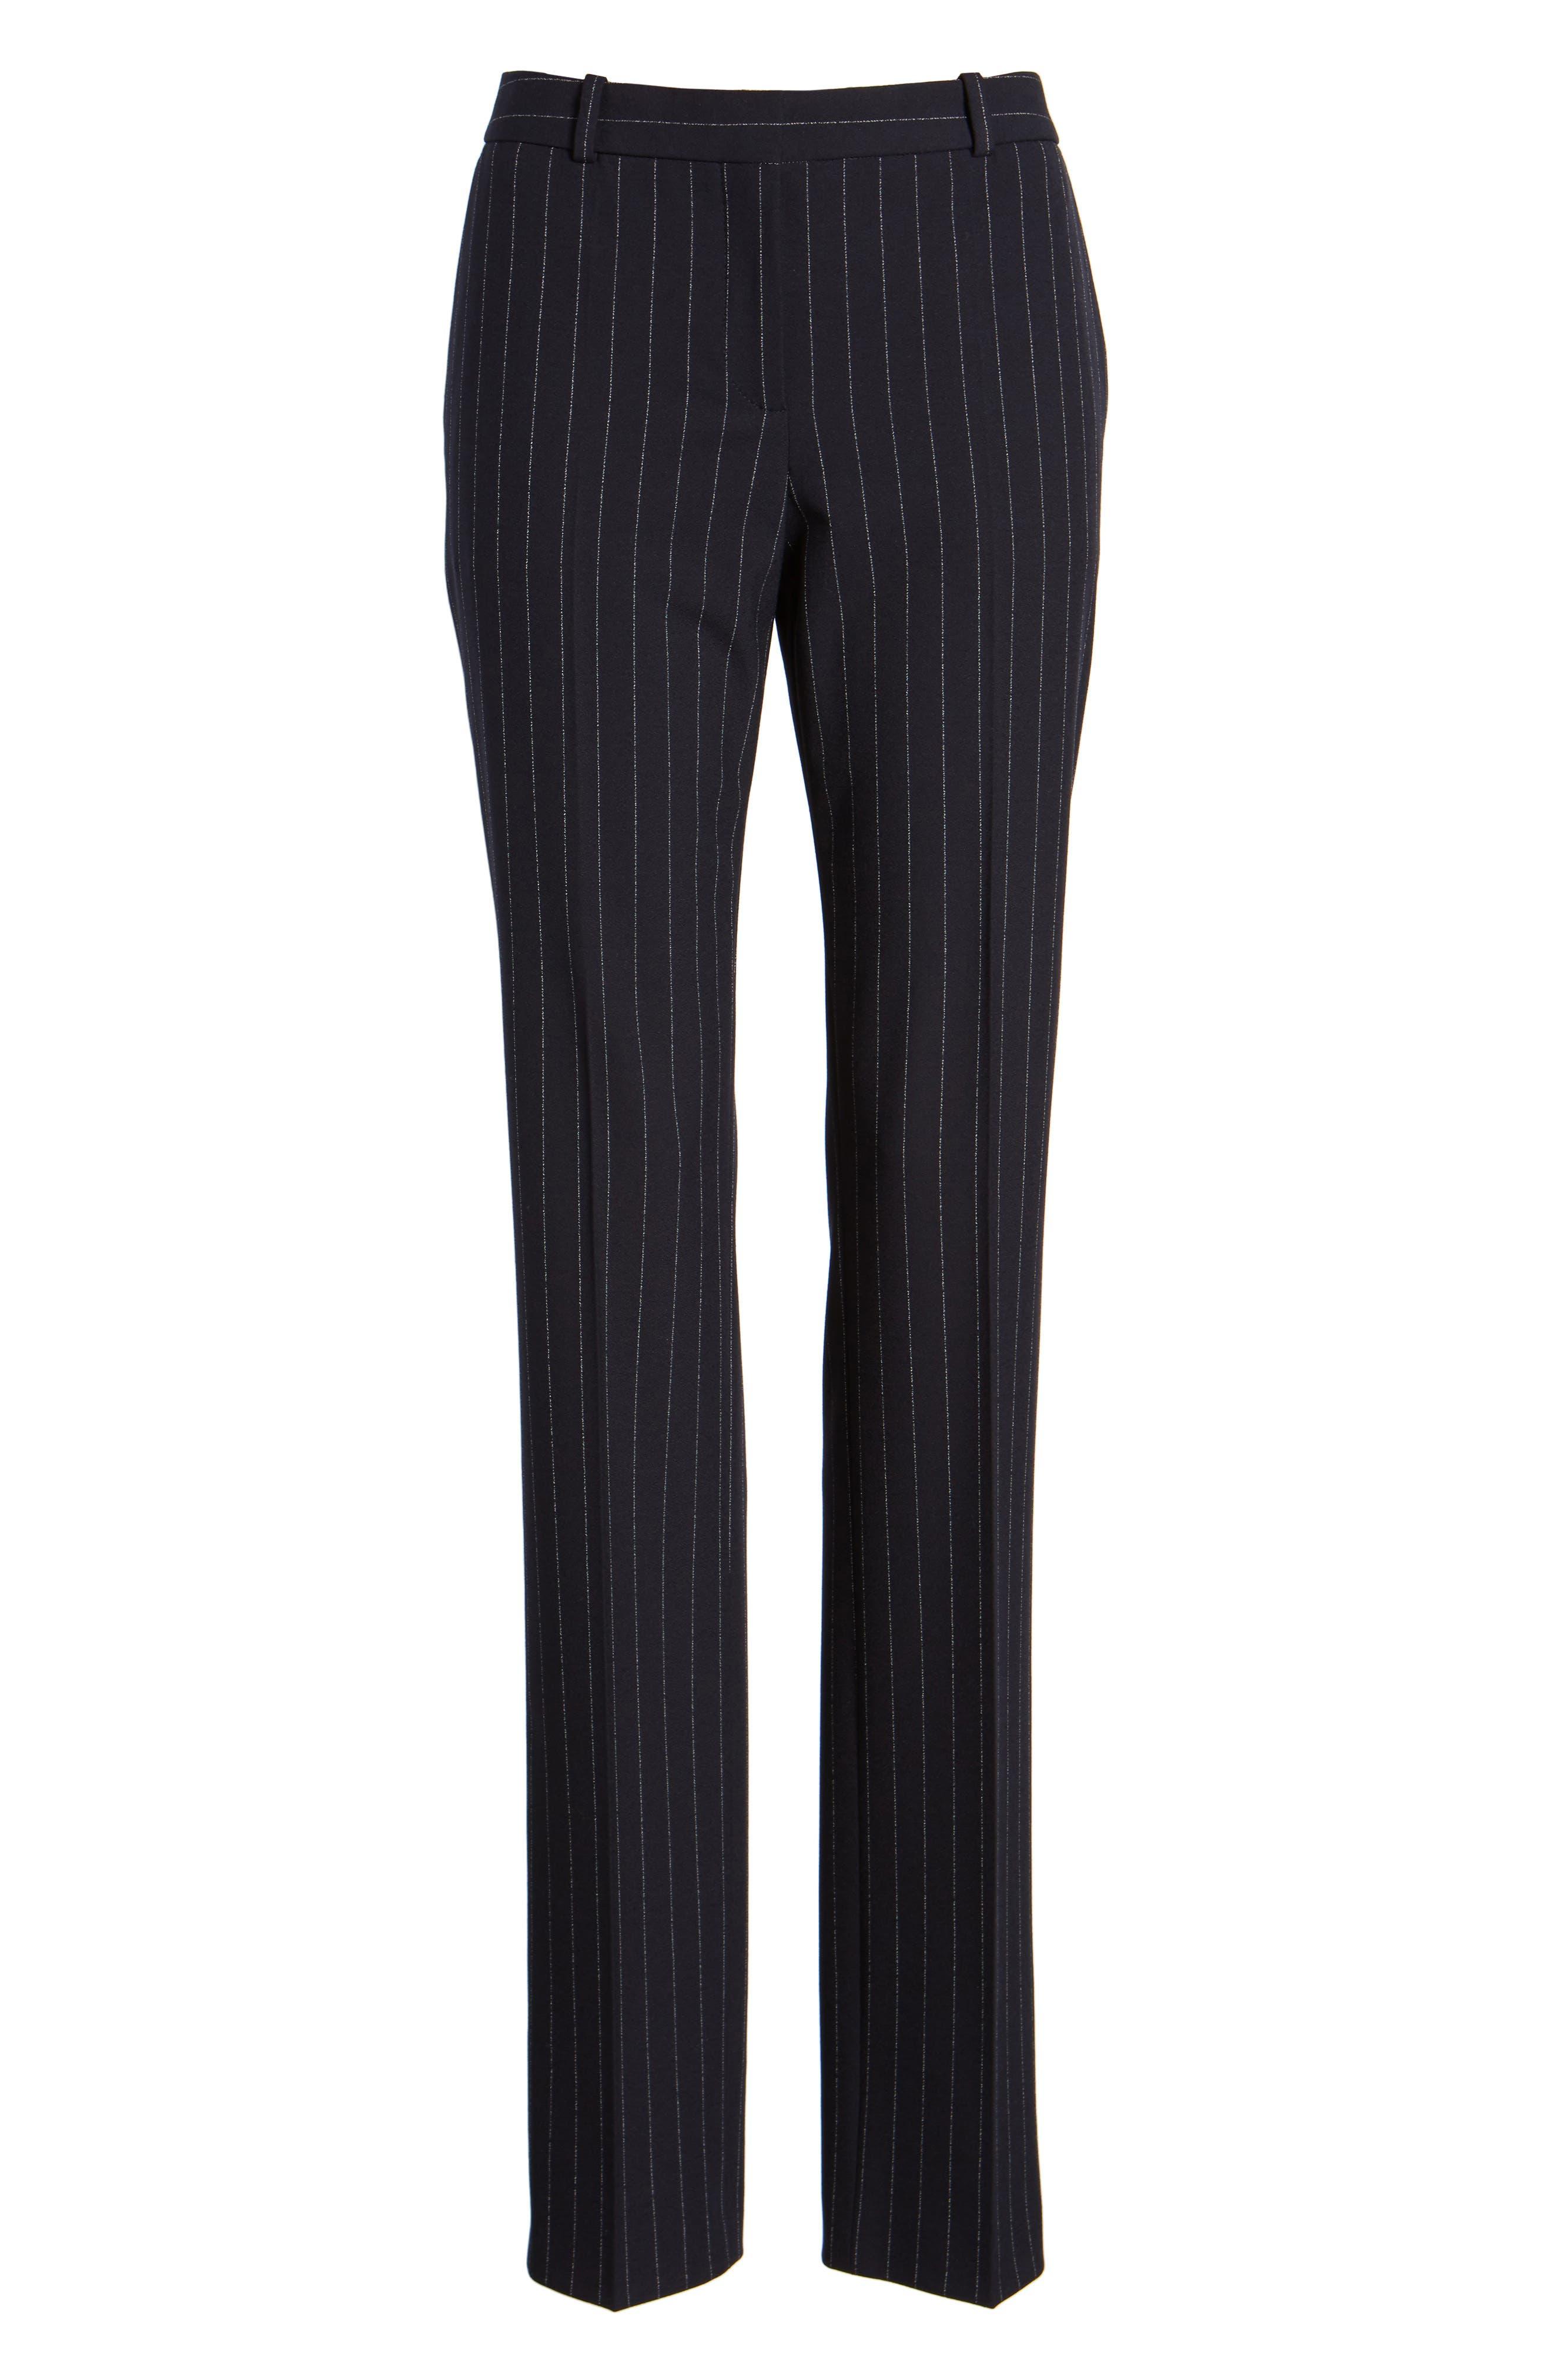 Titana Pinstripe Suit Trousers,                             Alternate thumbnail 7, color,                             461